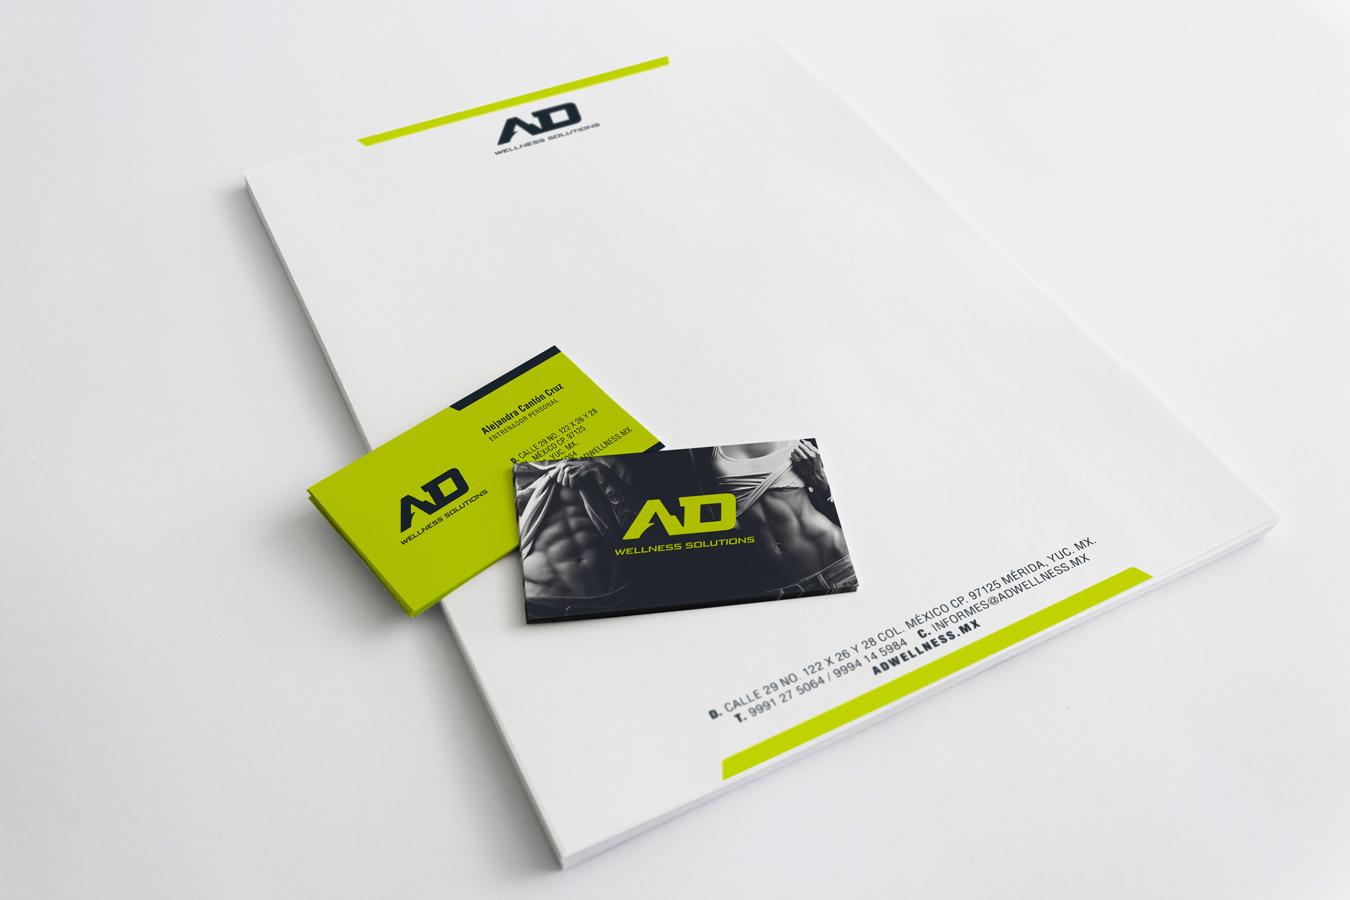 AD Wellness Solutions - Branding